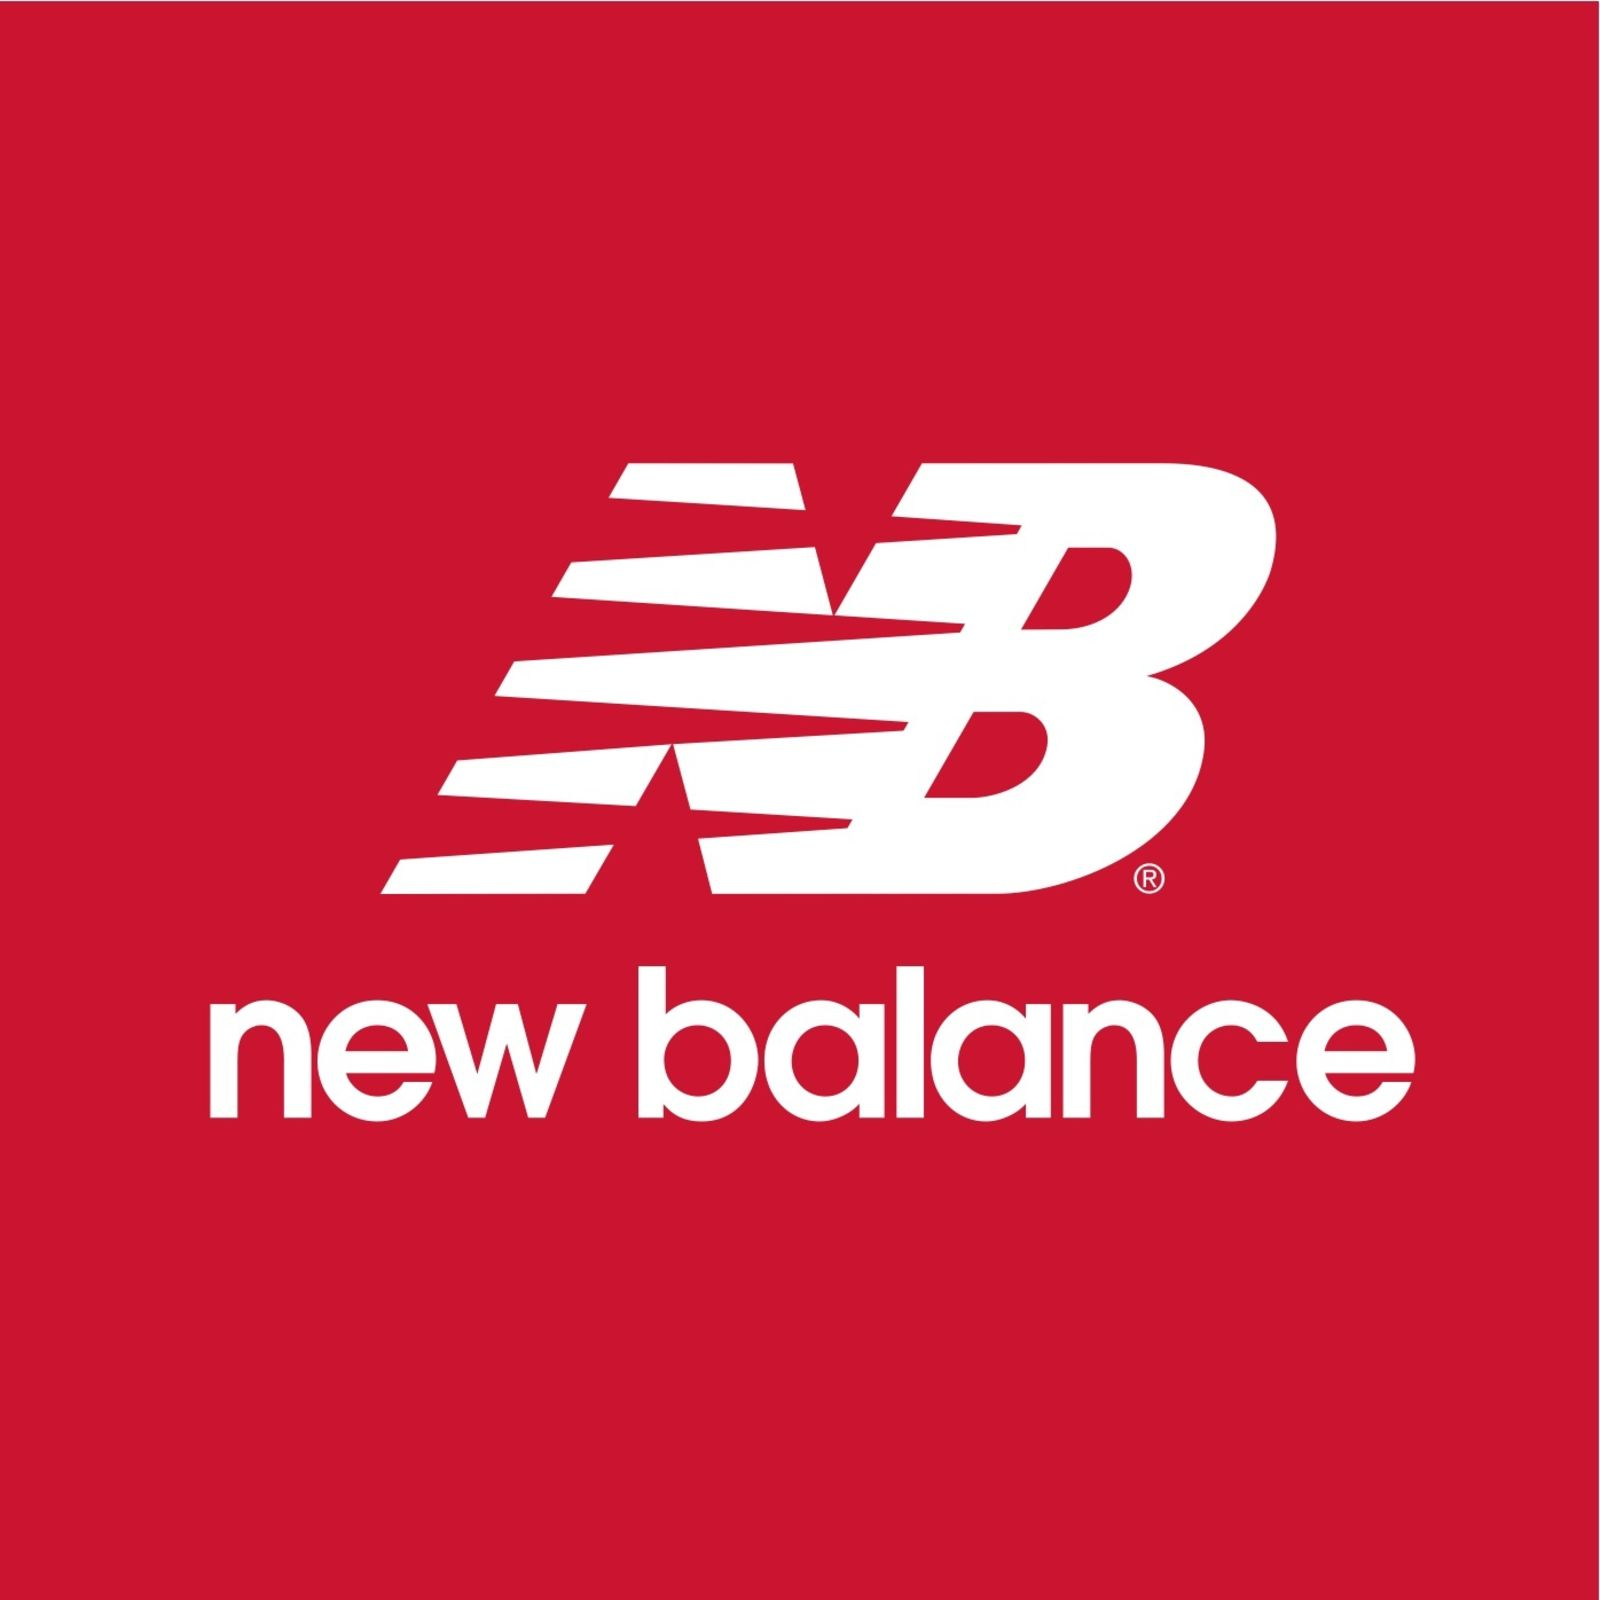 New Balance (Bild 1)